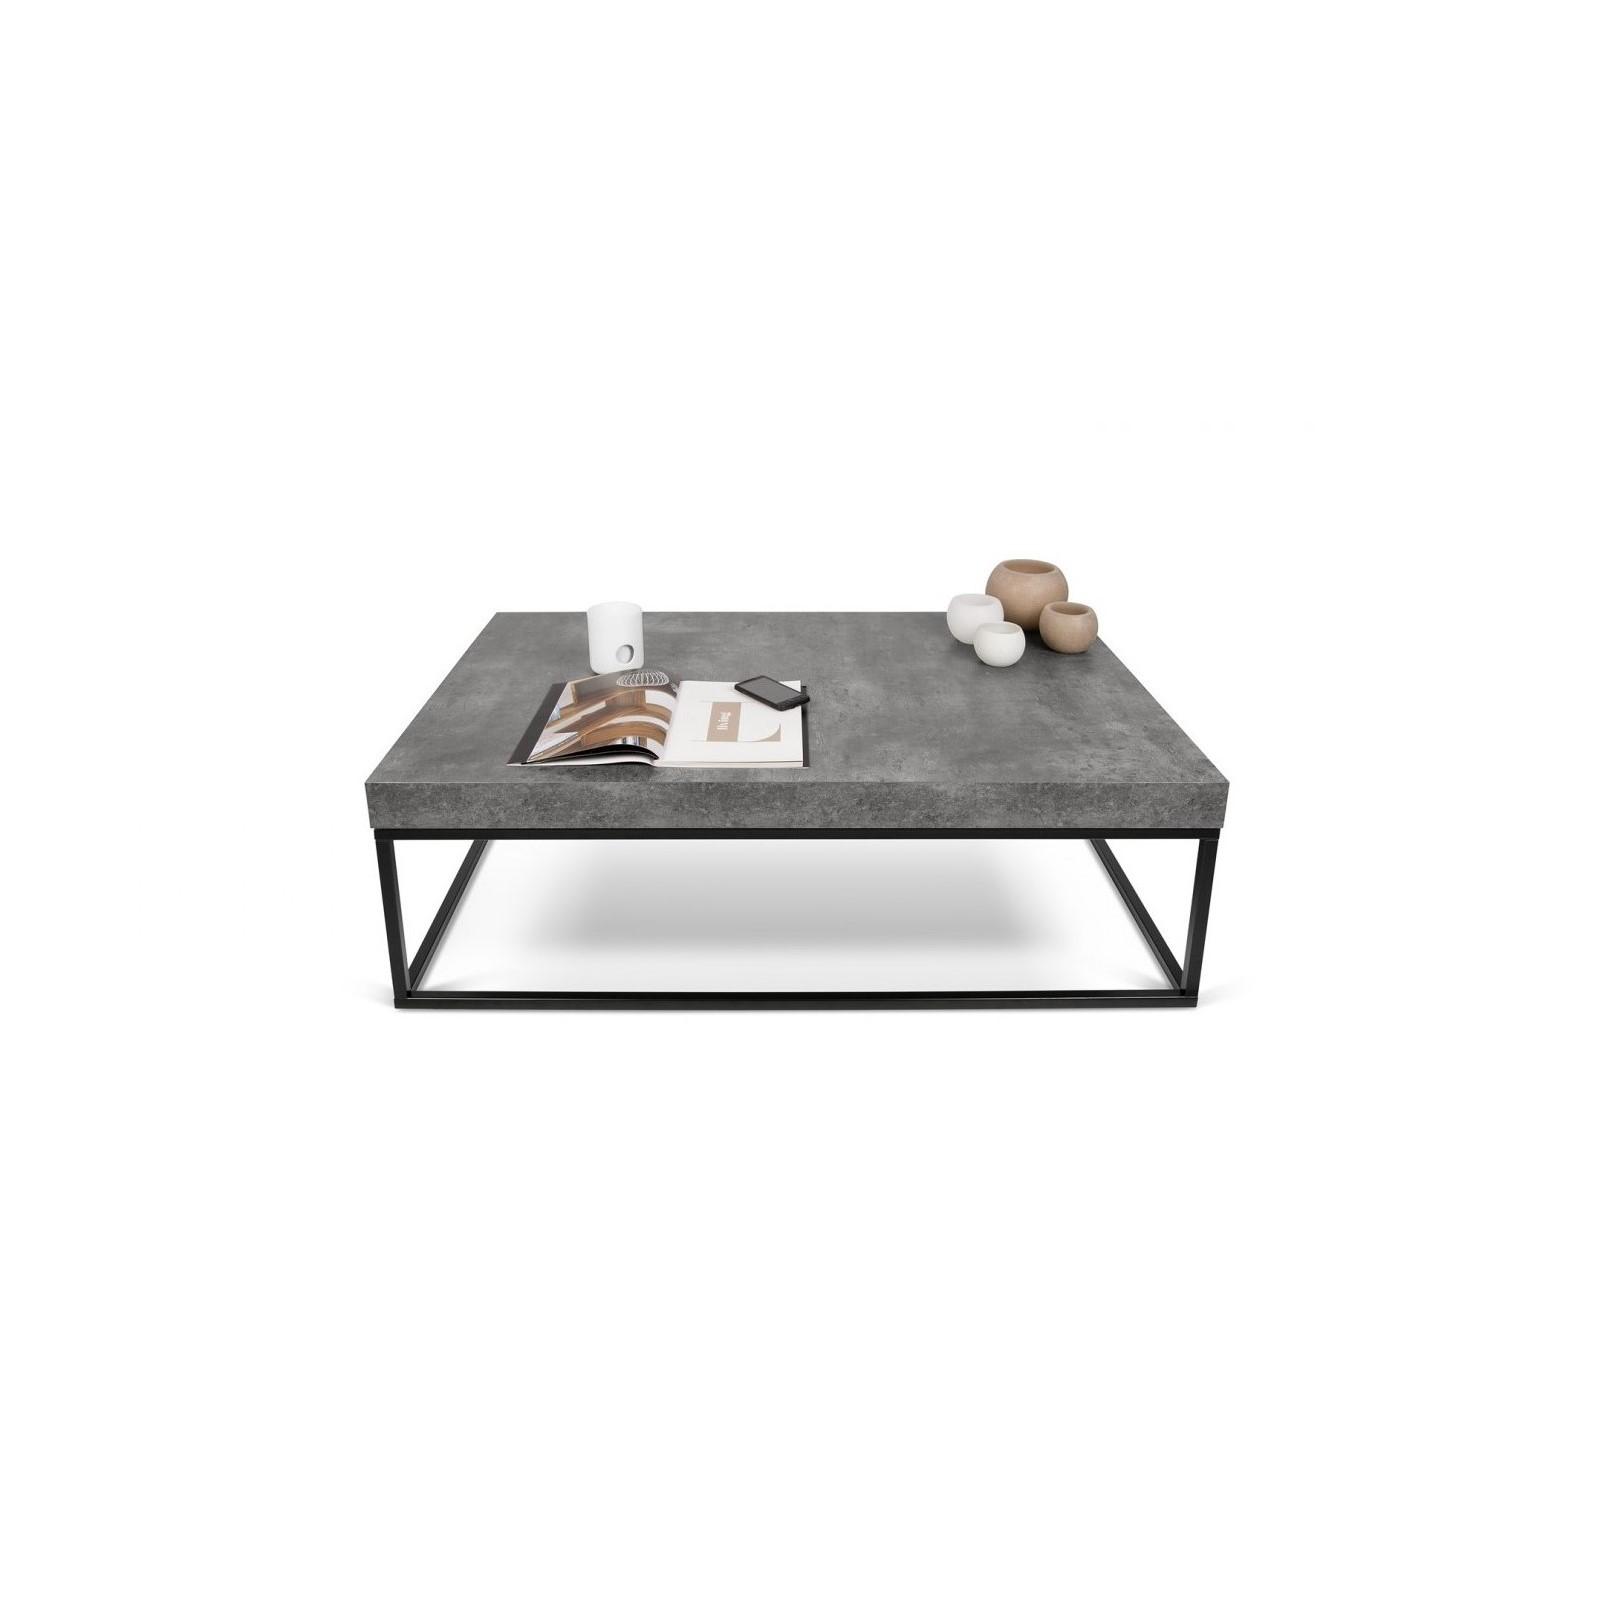 Table Basse Beton 120 Arne Concept